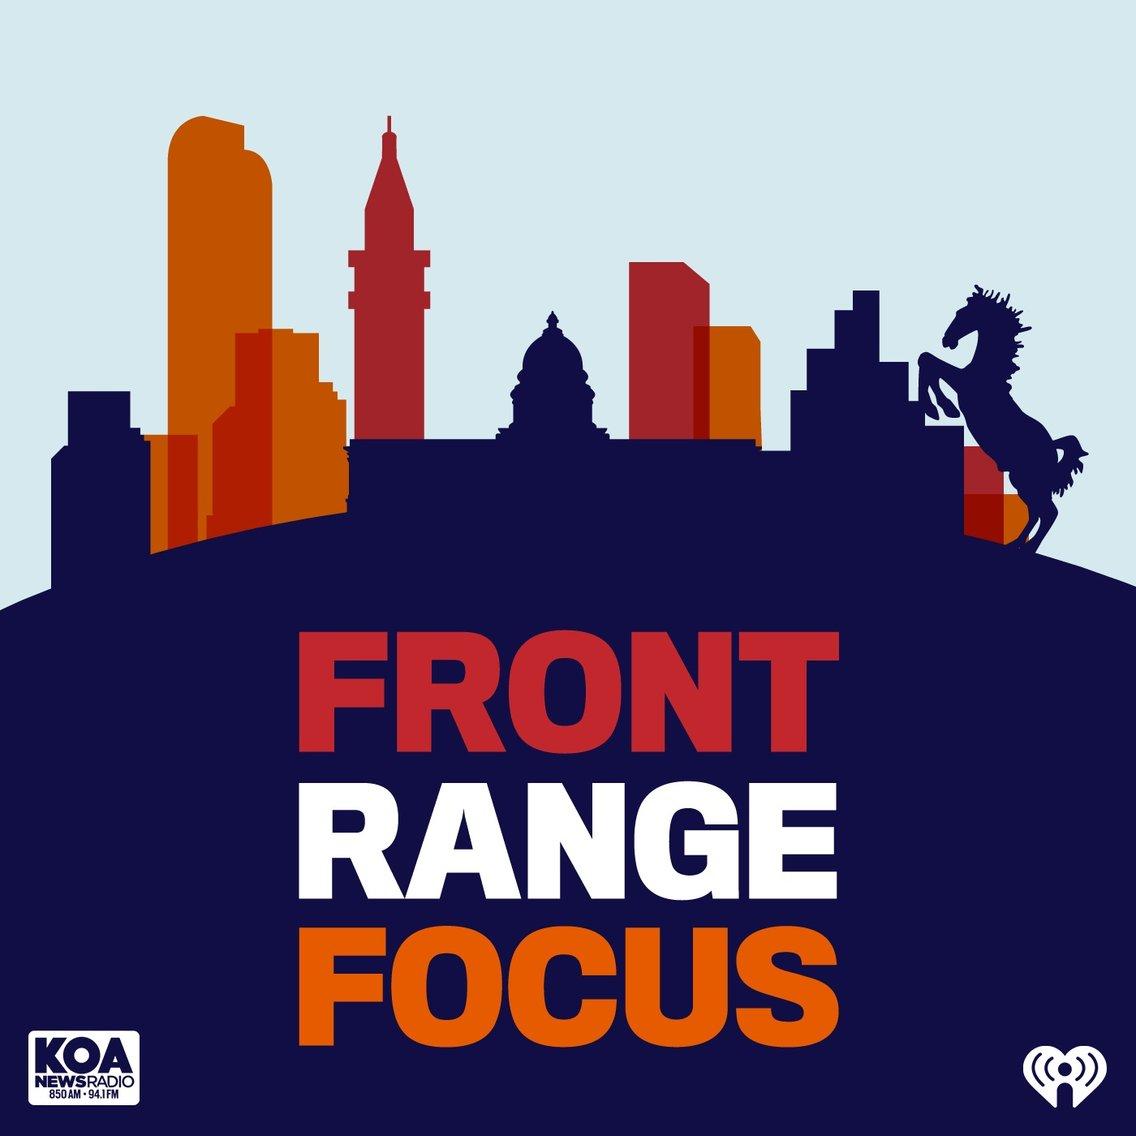 Front Range Focus - Cover Image